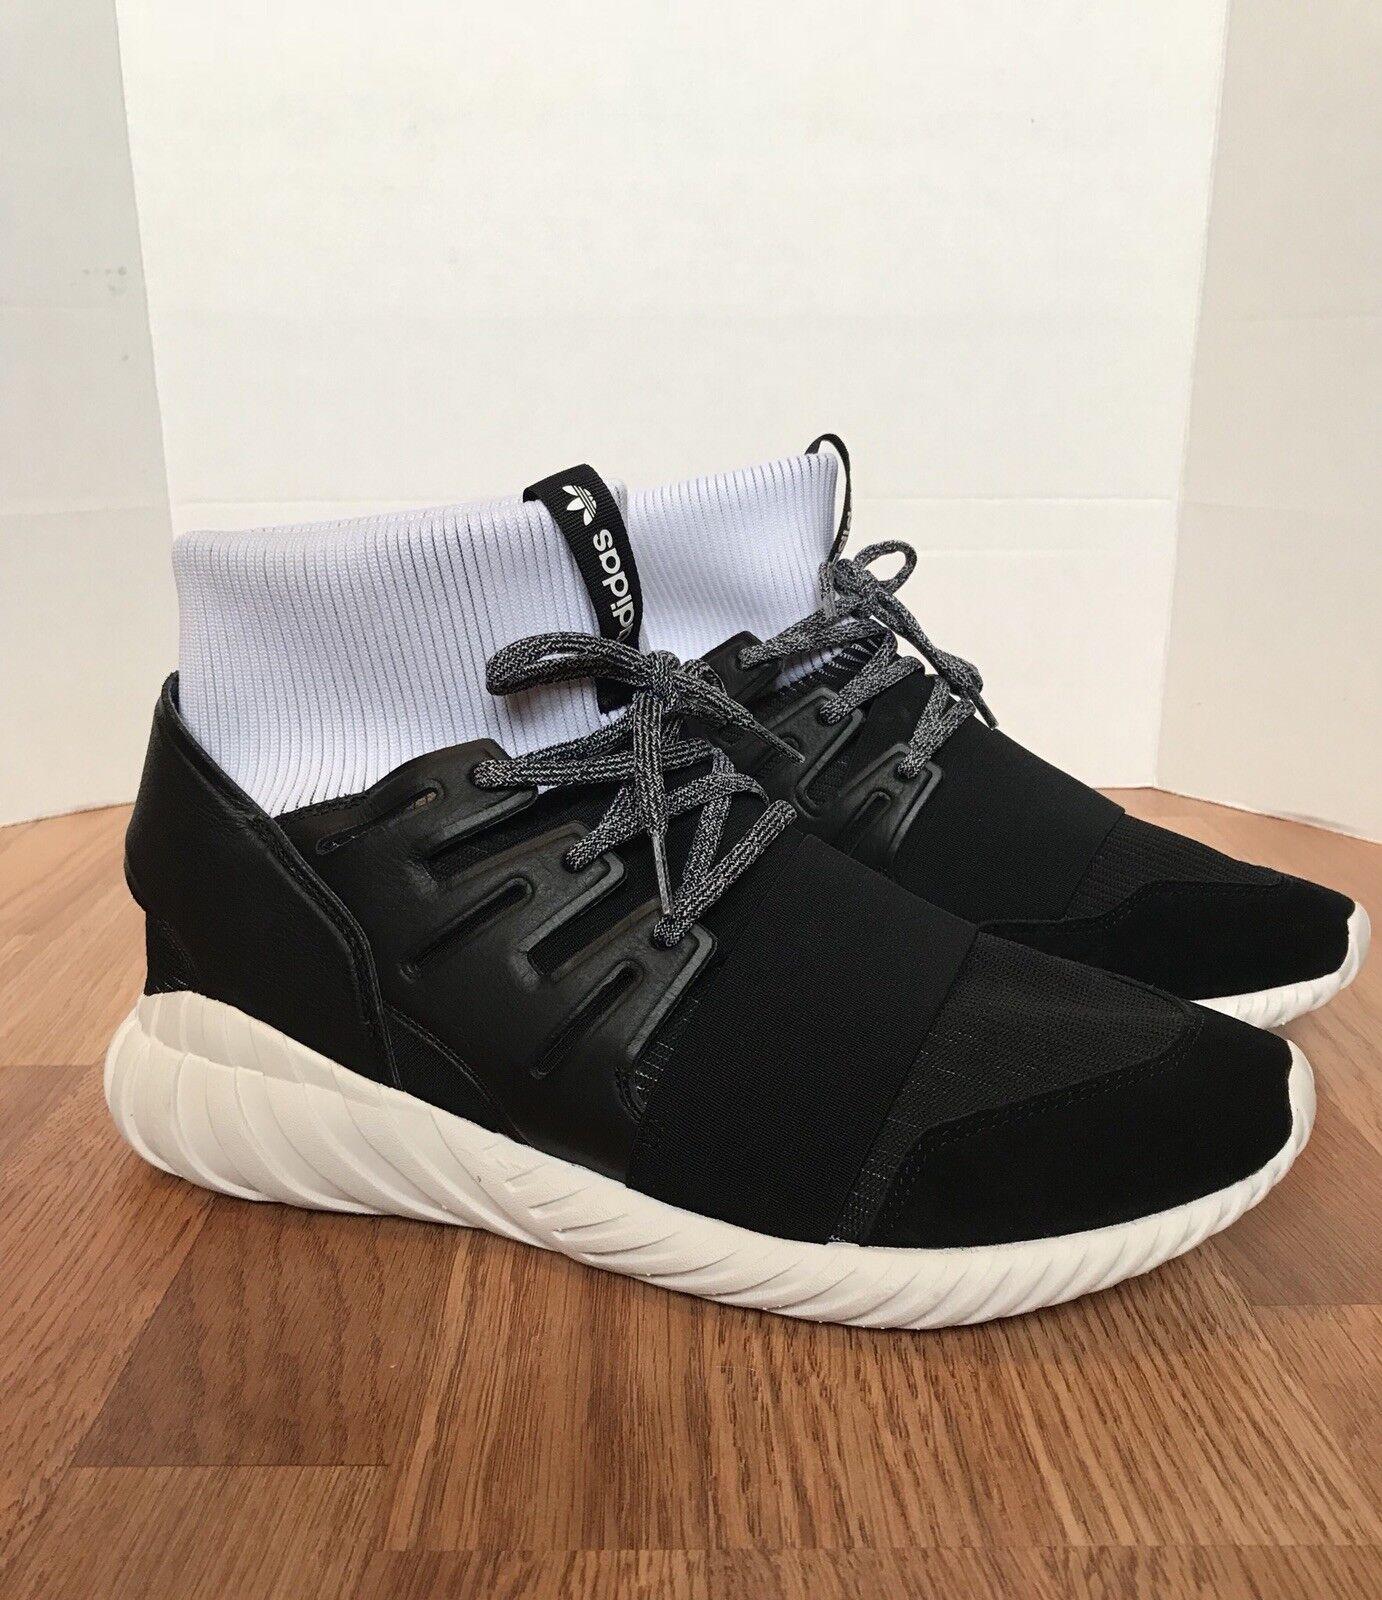 NEW ? Adidas Originals Tubular Doom Primeknit Shoes- Size 12 Uomo